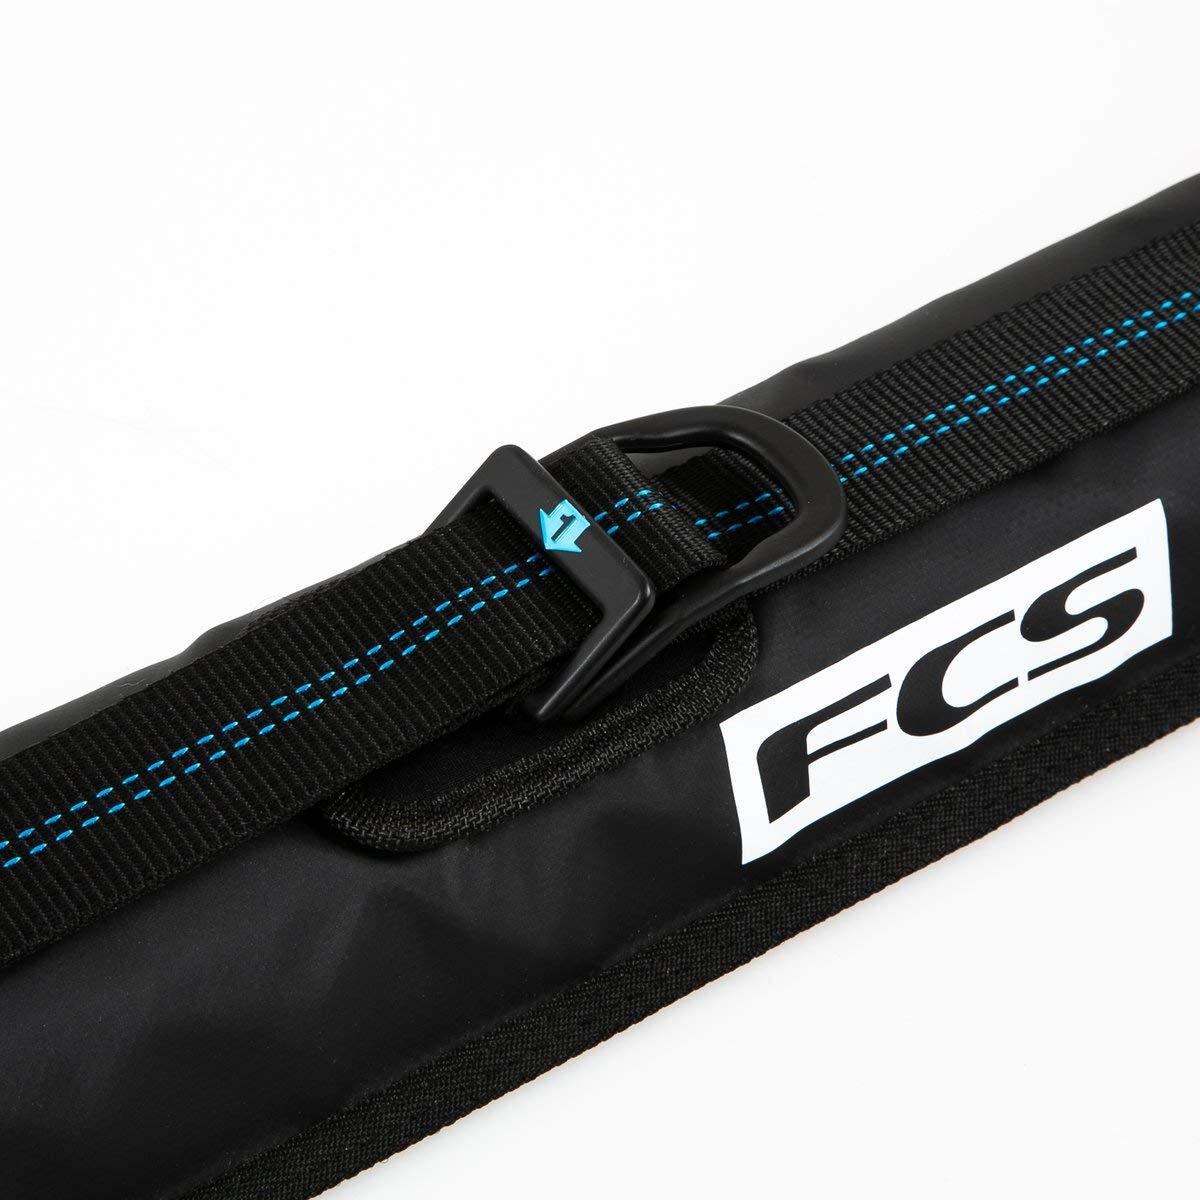 Double FCS Premium D-Ring Soft Surfboard//SUP Car Rack